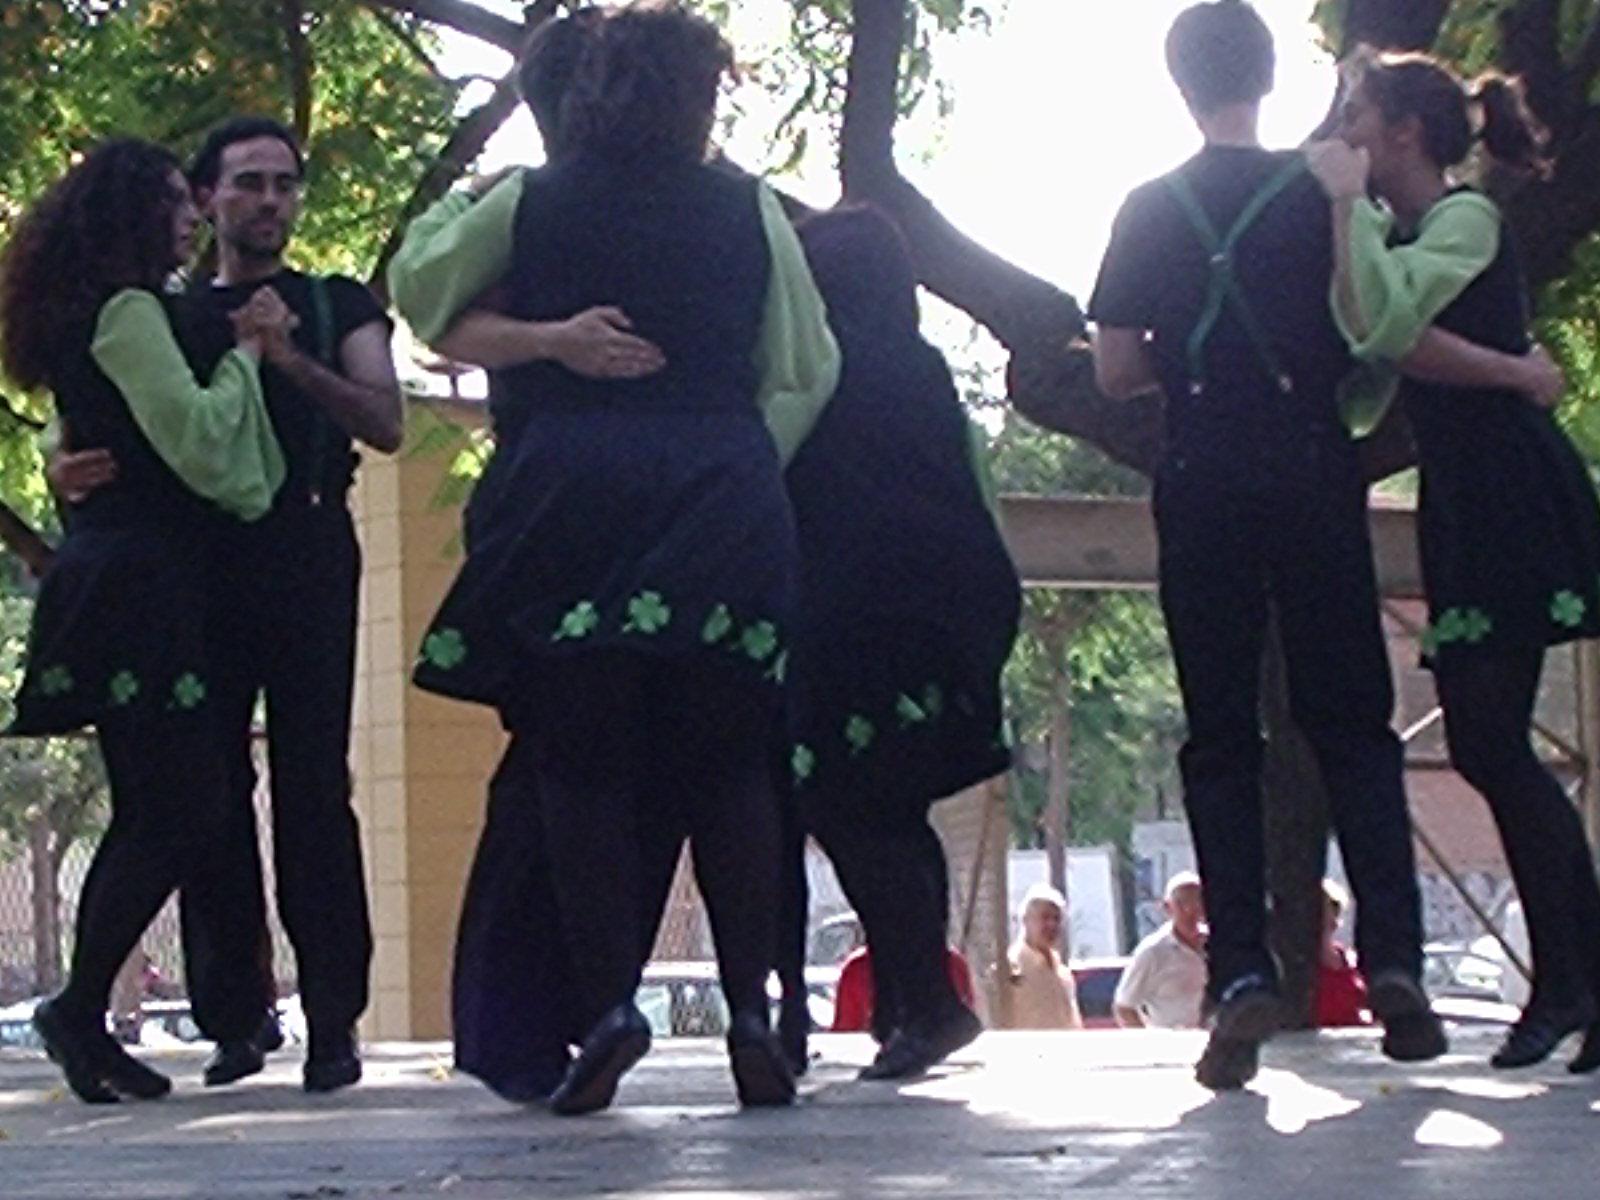 Grupo Irlandes - Fiesta San Iago